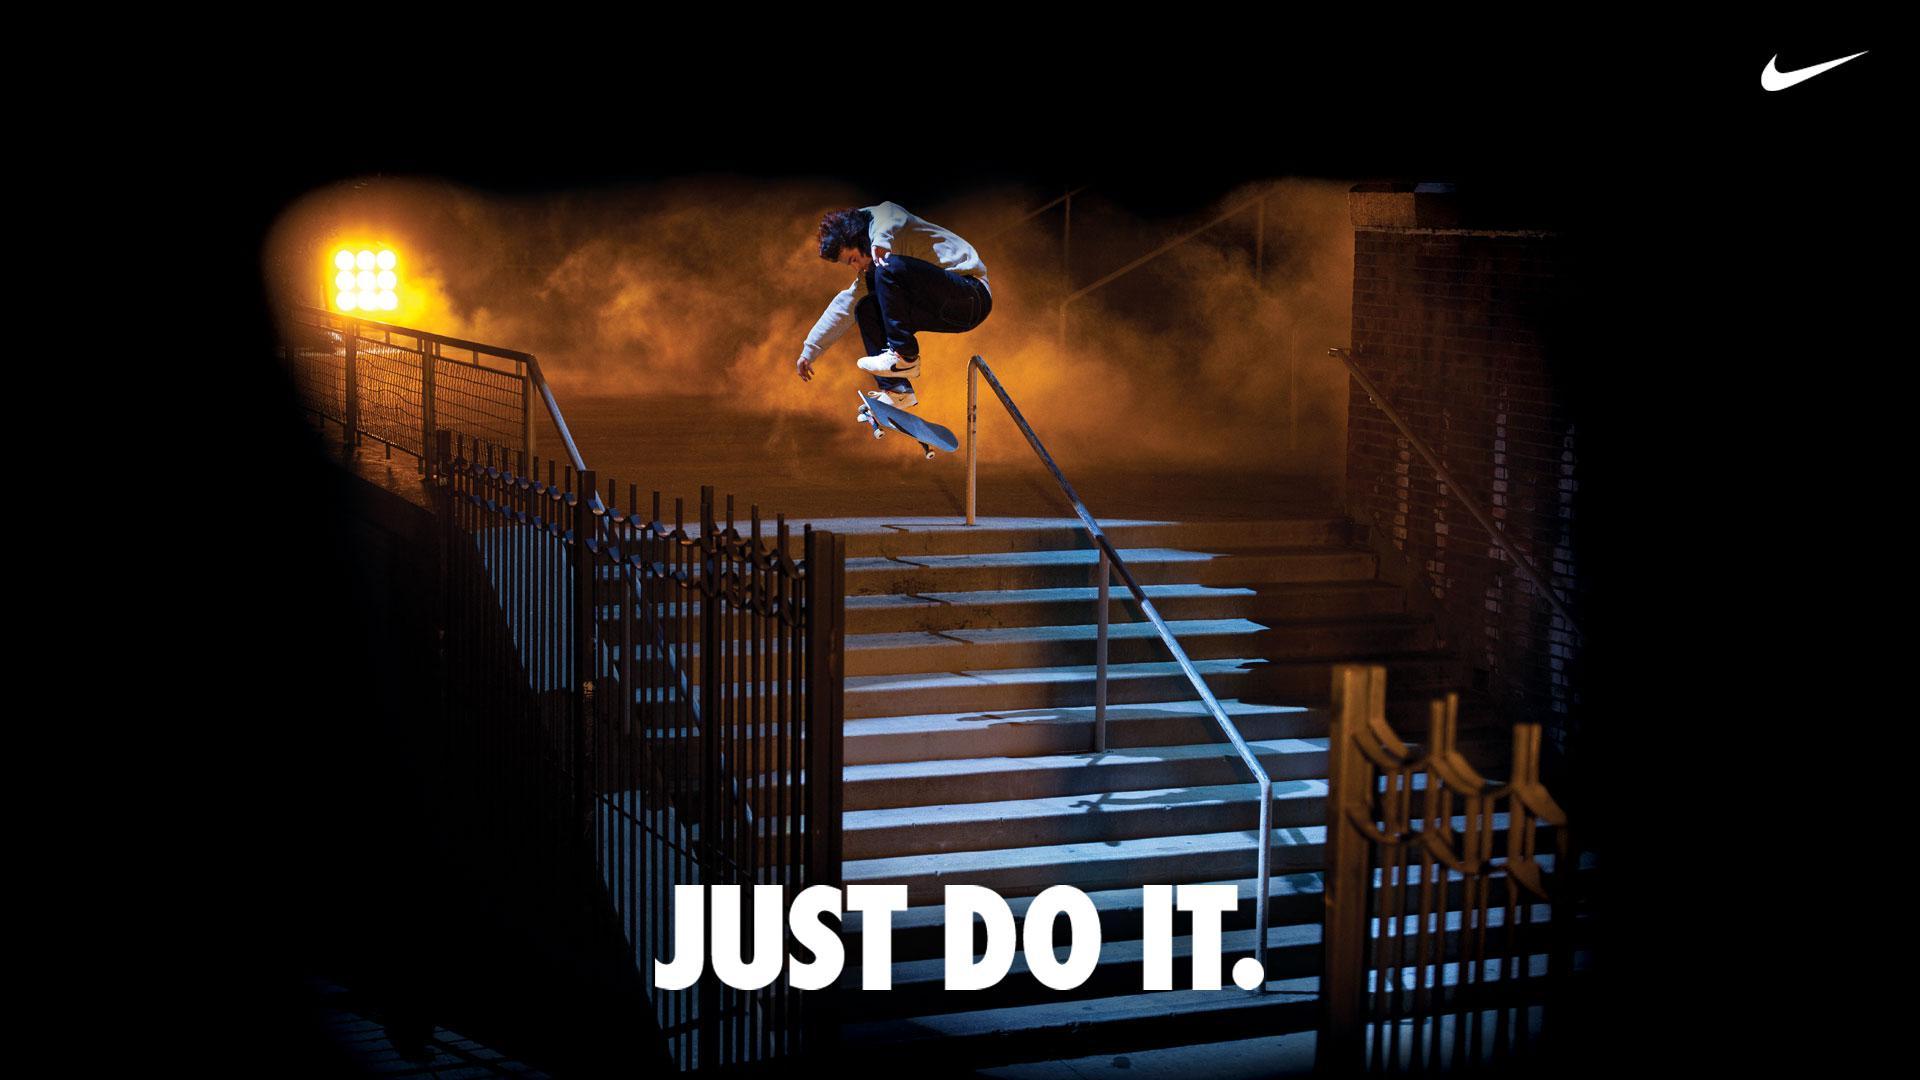 Motivational Quotes Wallpapers Free Download Just Do It Backgrounds Pixelstalk Net